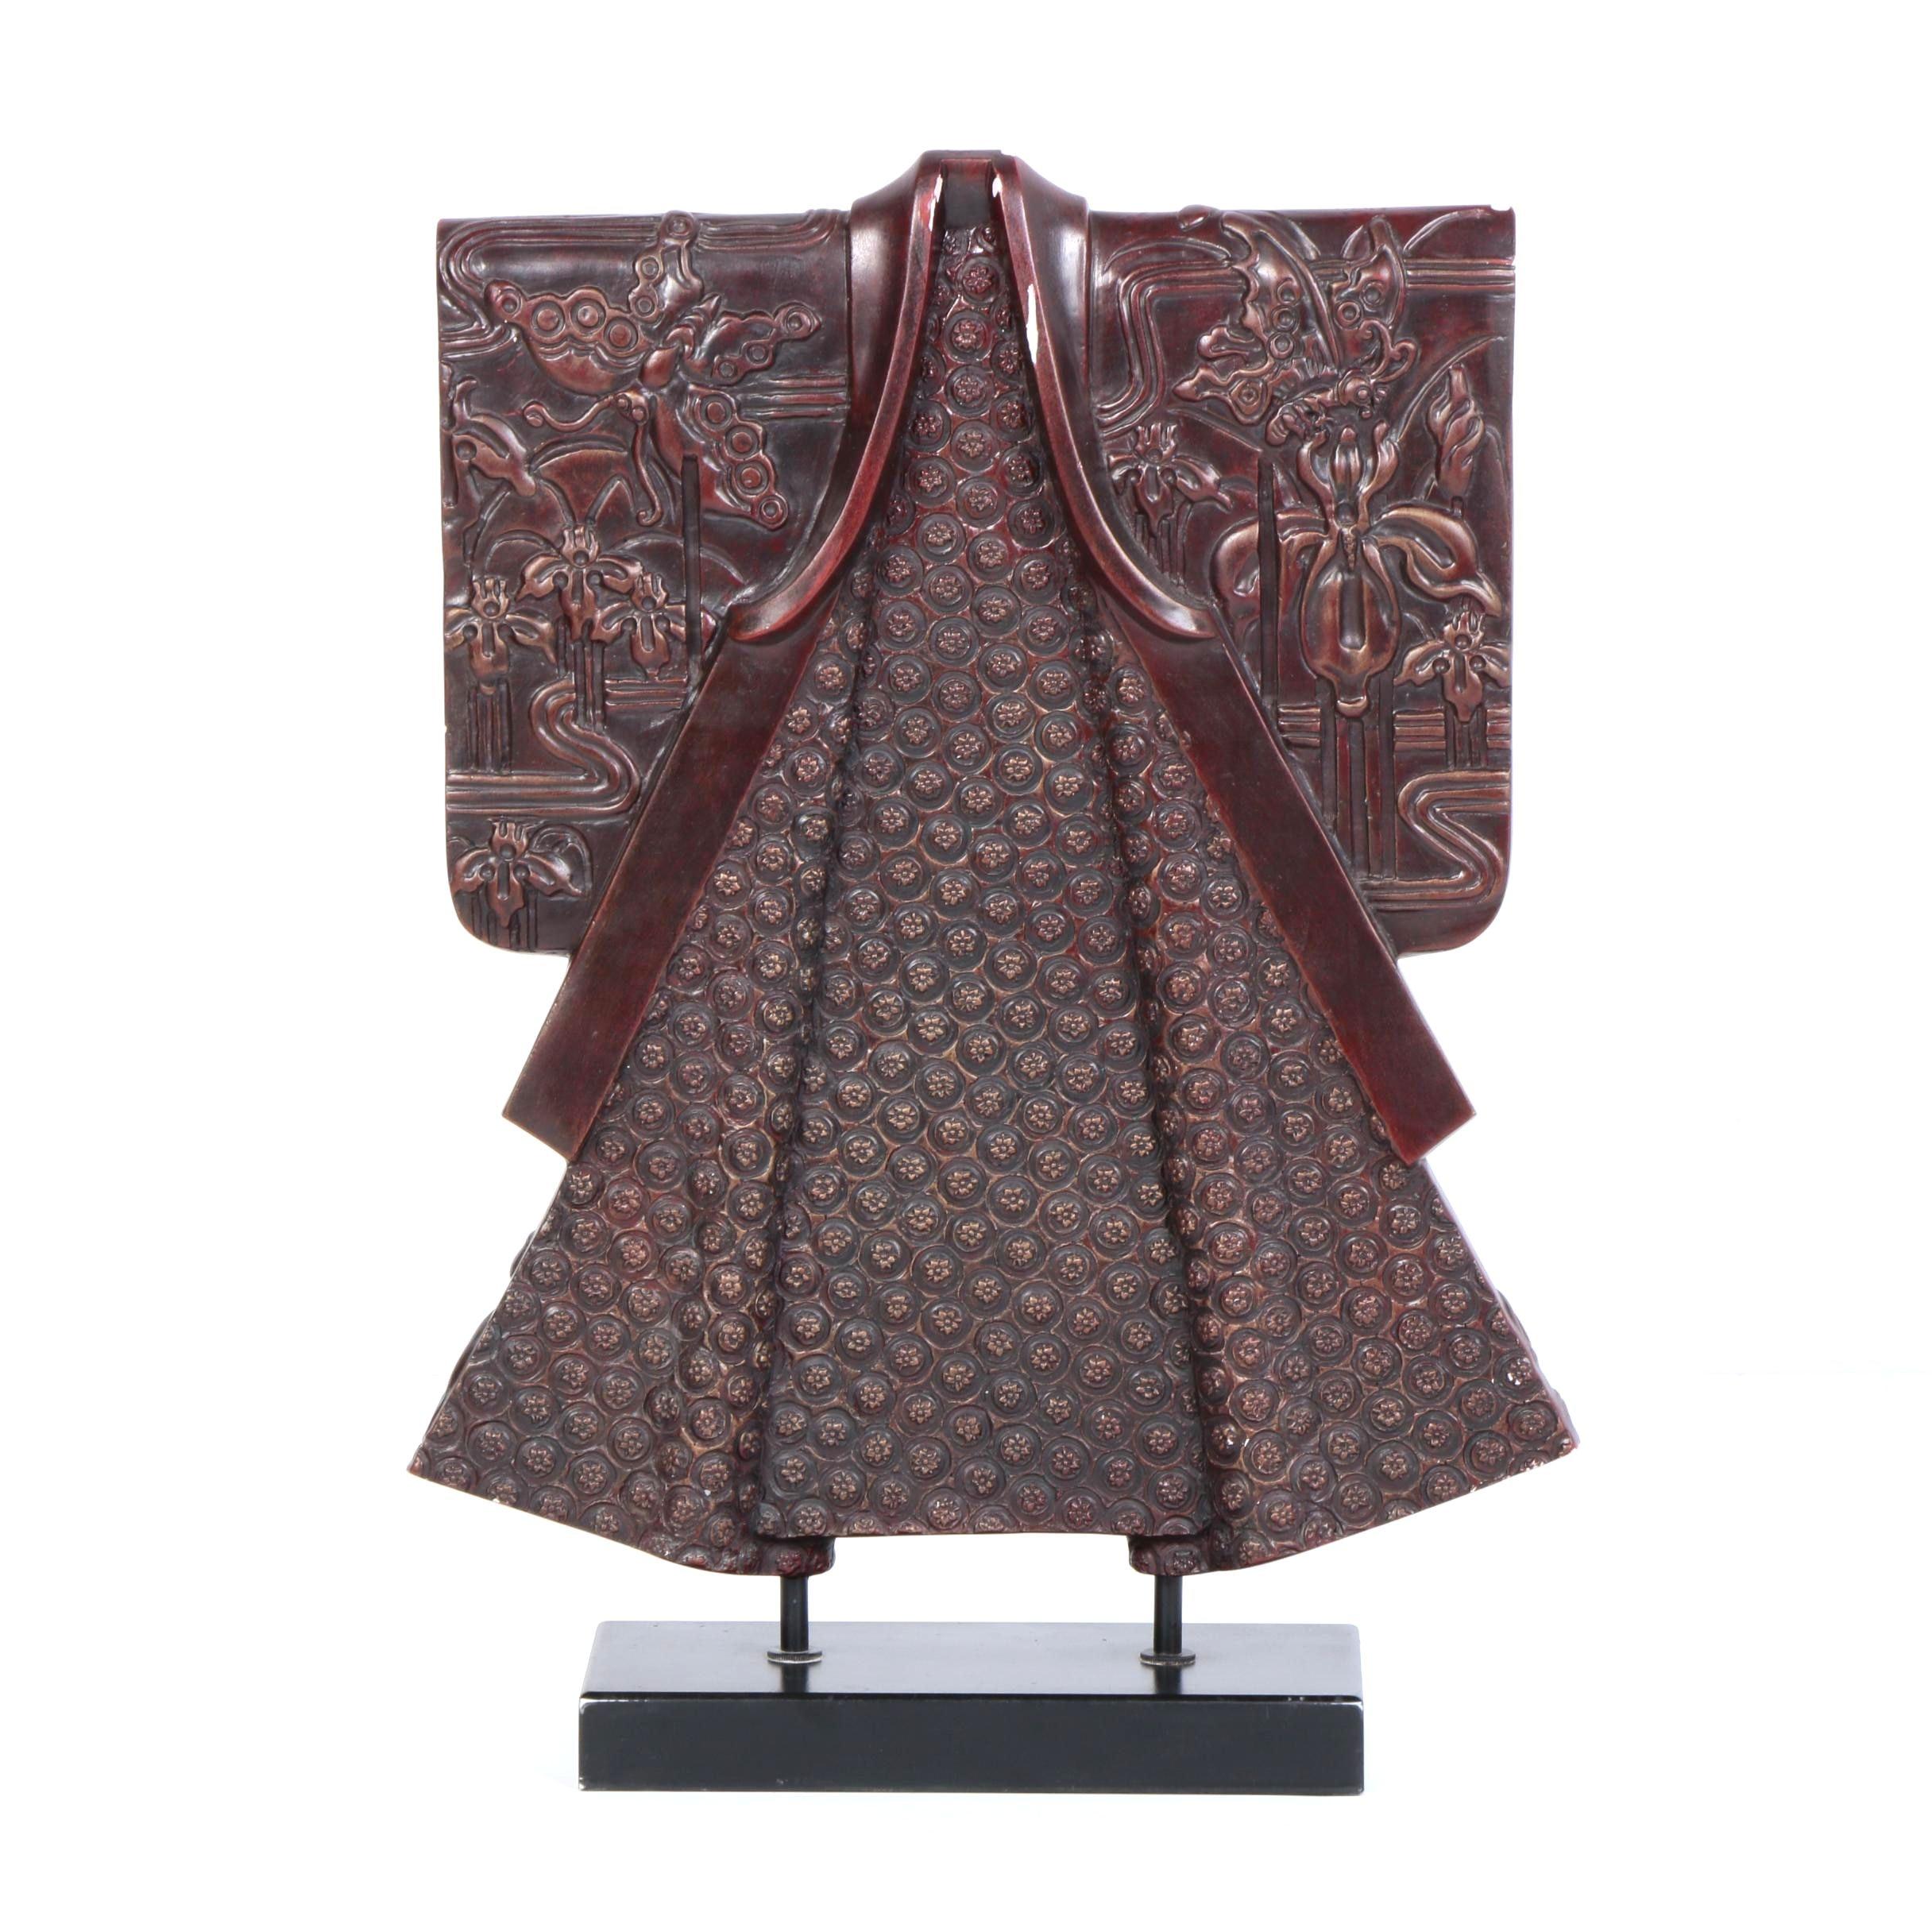 Mixed Media Kimono Sculpture on Stand